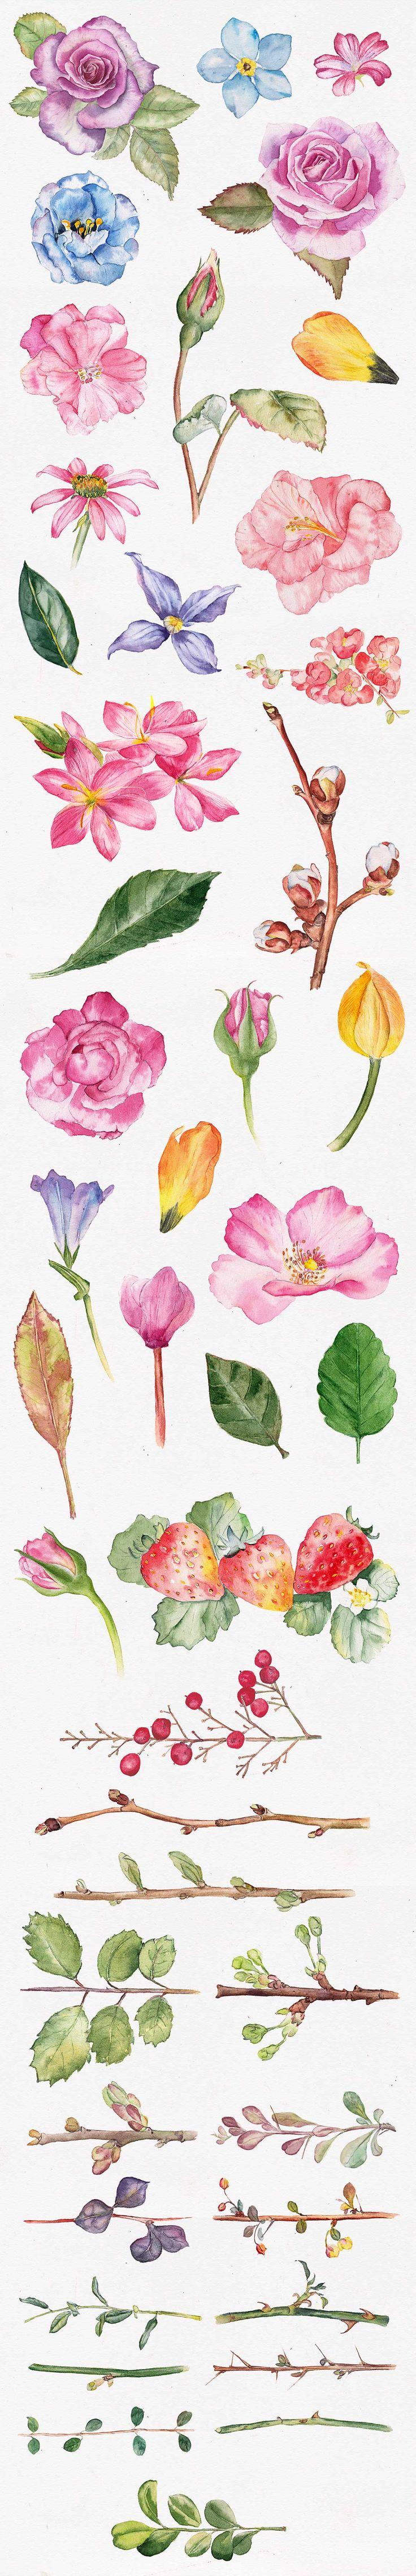 Custom Wreath Generator 2 + Flowers by emine on Creative Market